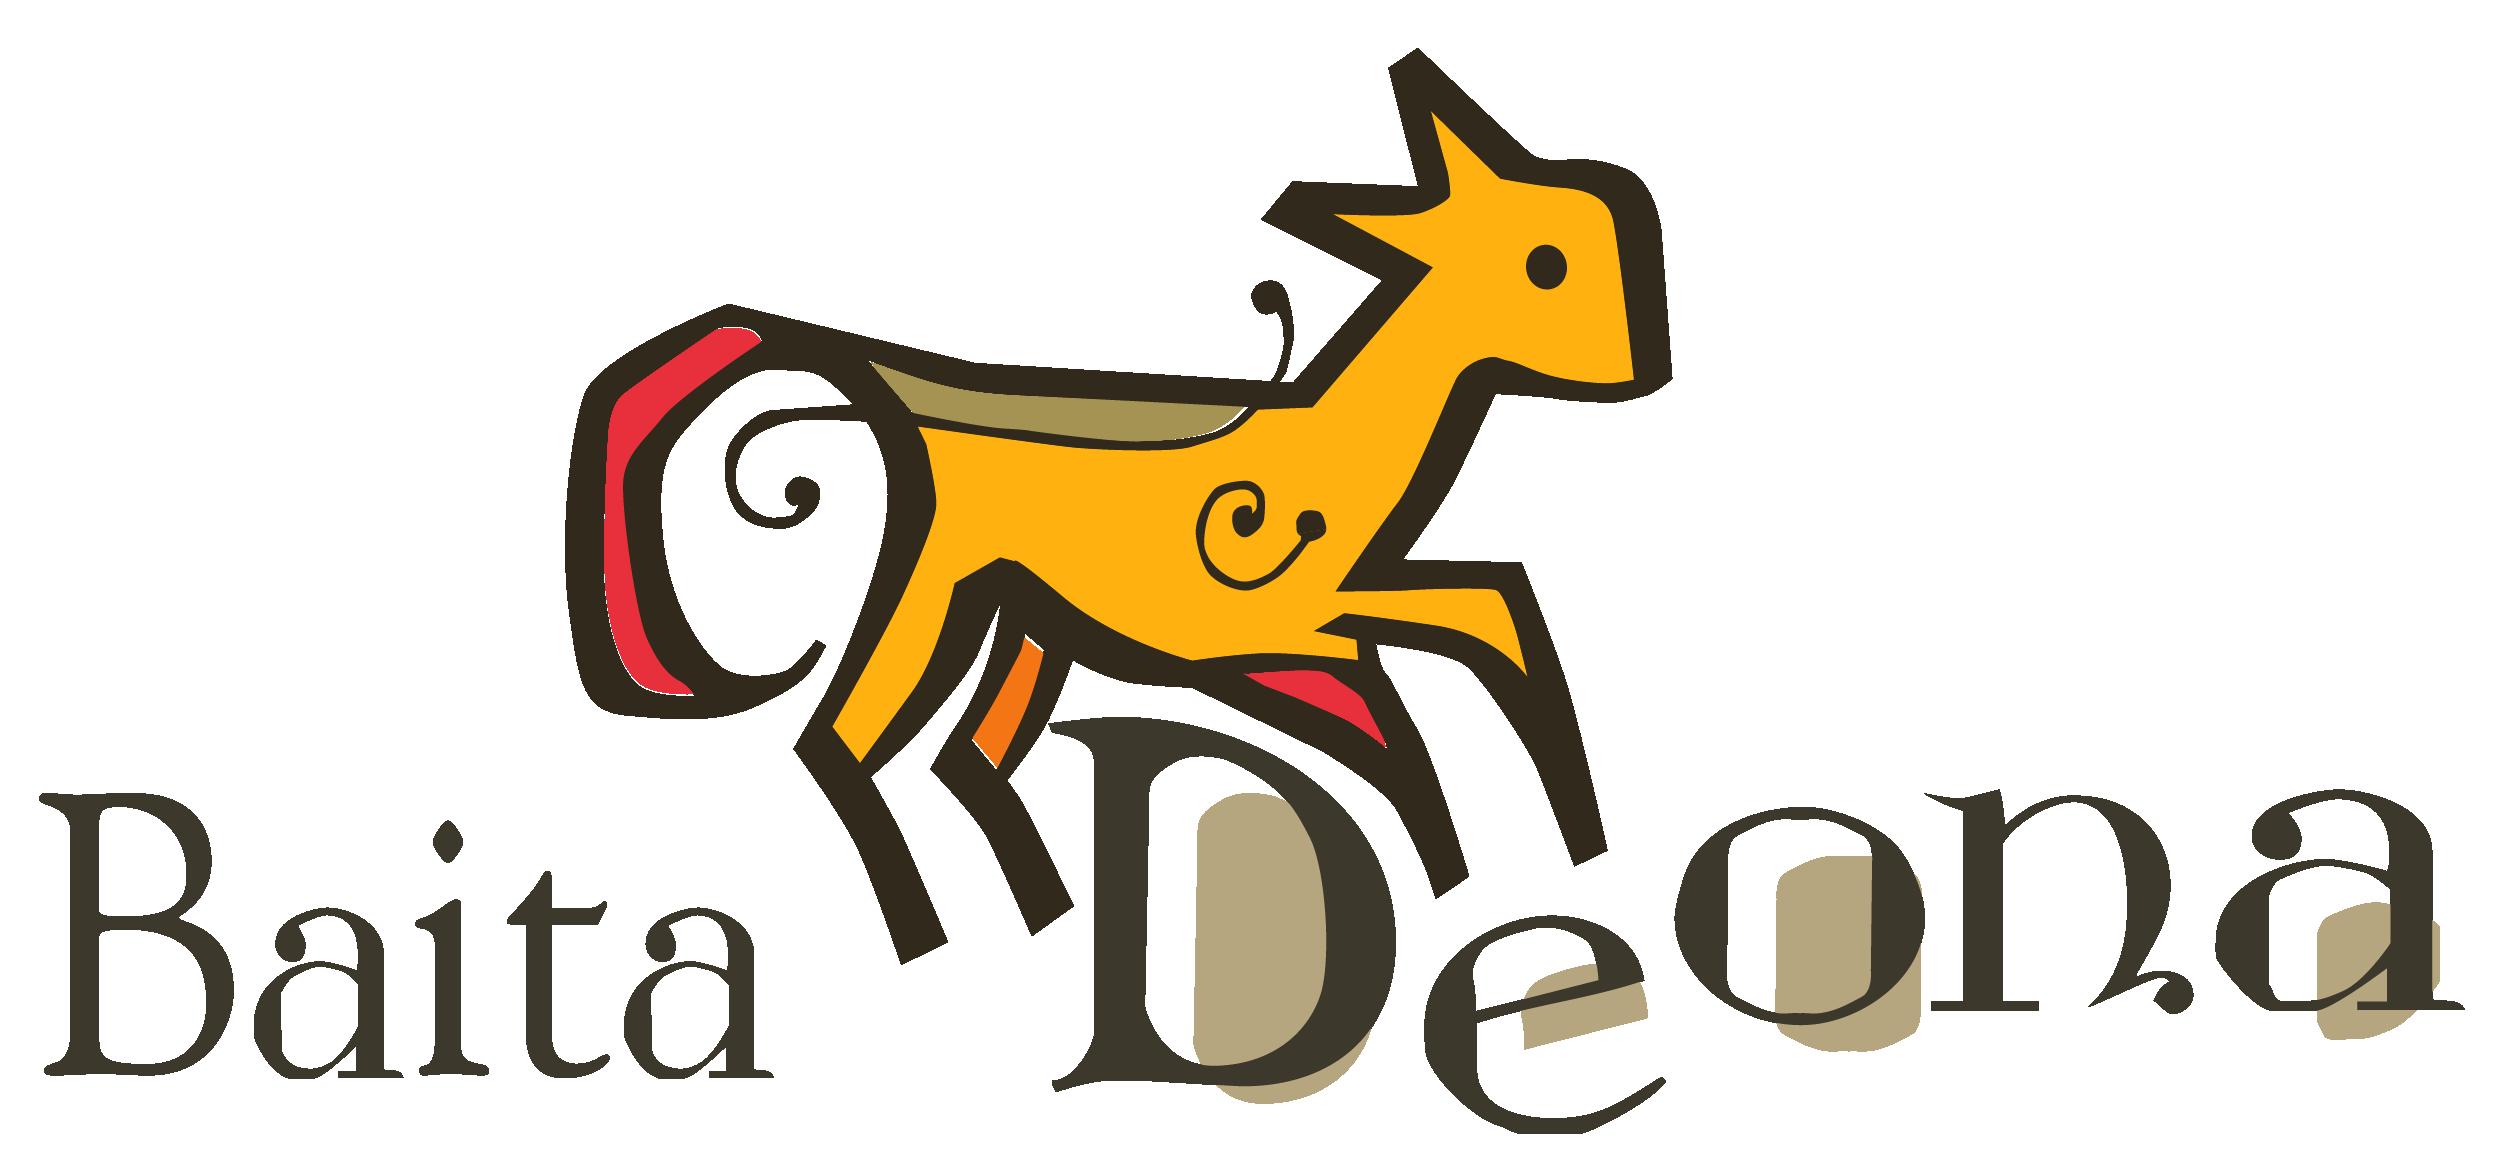 Baita Deona | Cibiana di Cadore